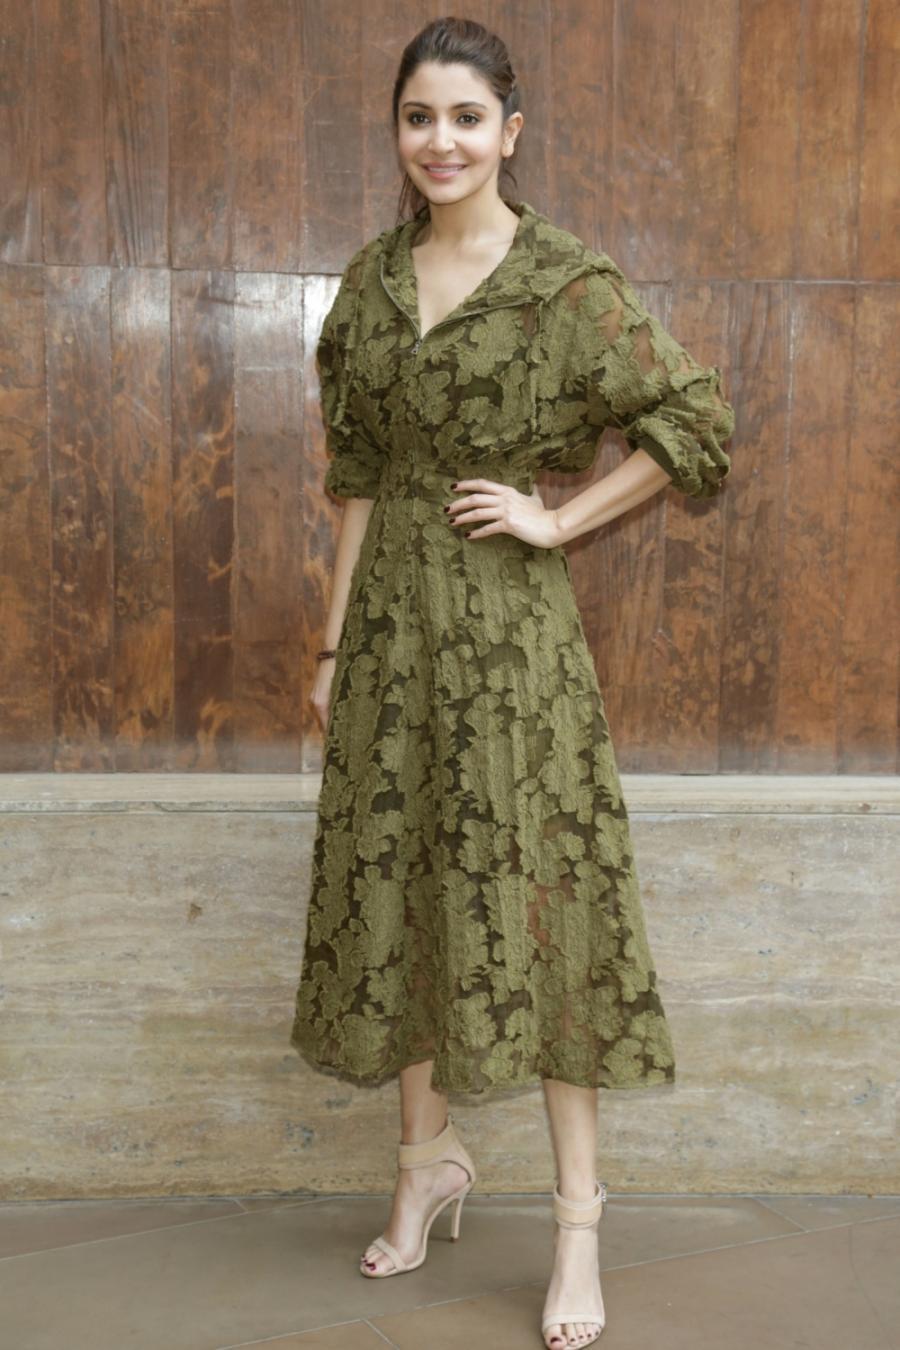 Anushka Sharma In Green Dress At New Delhi Film Promotional Event